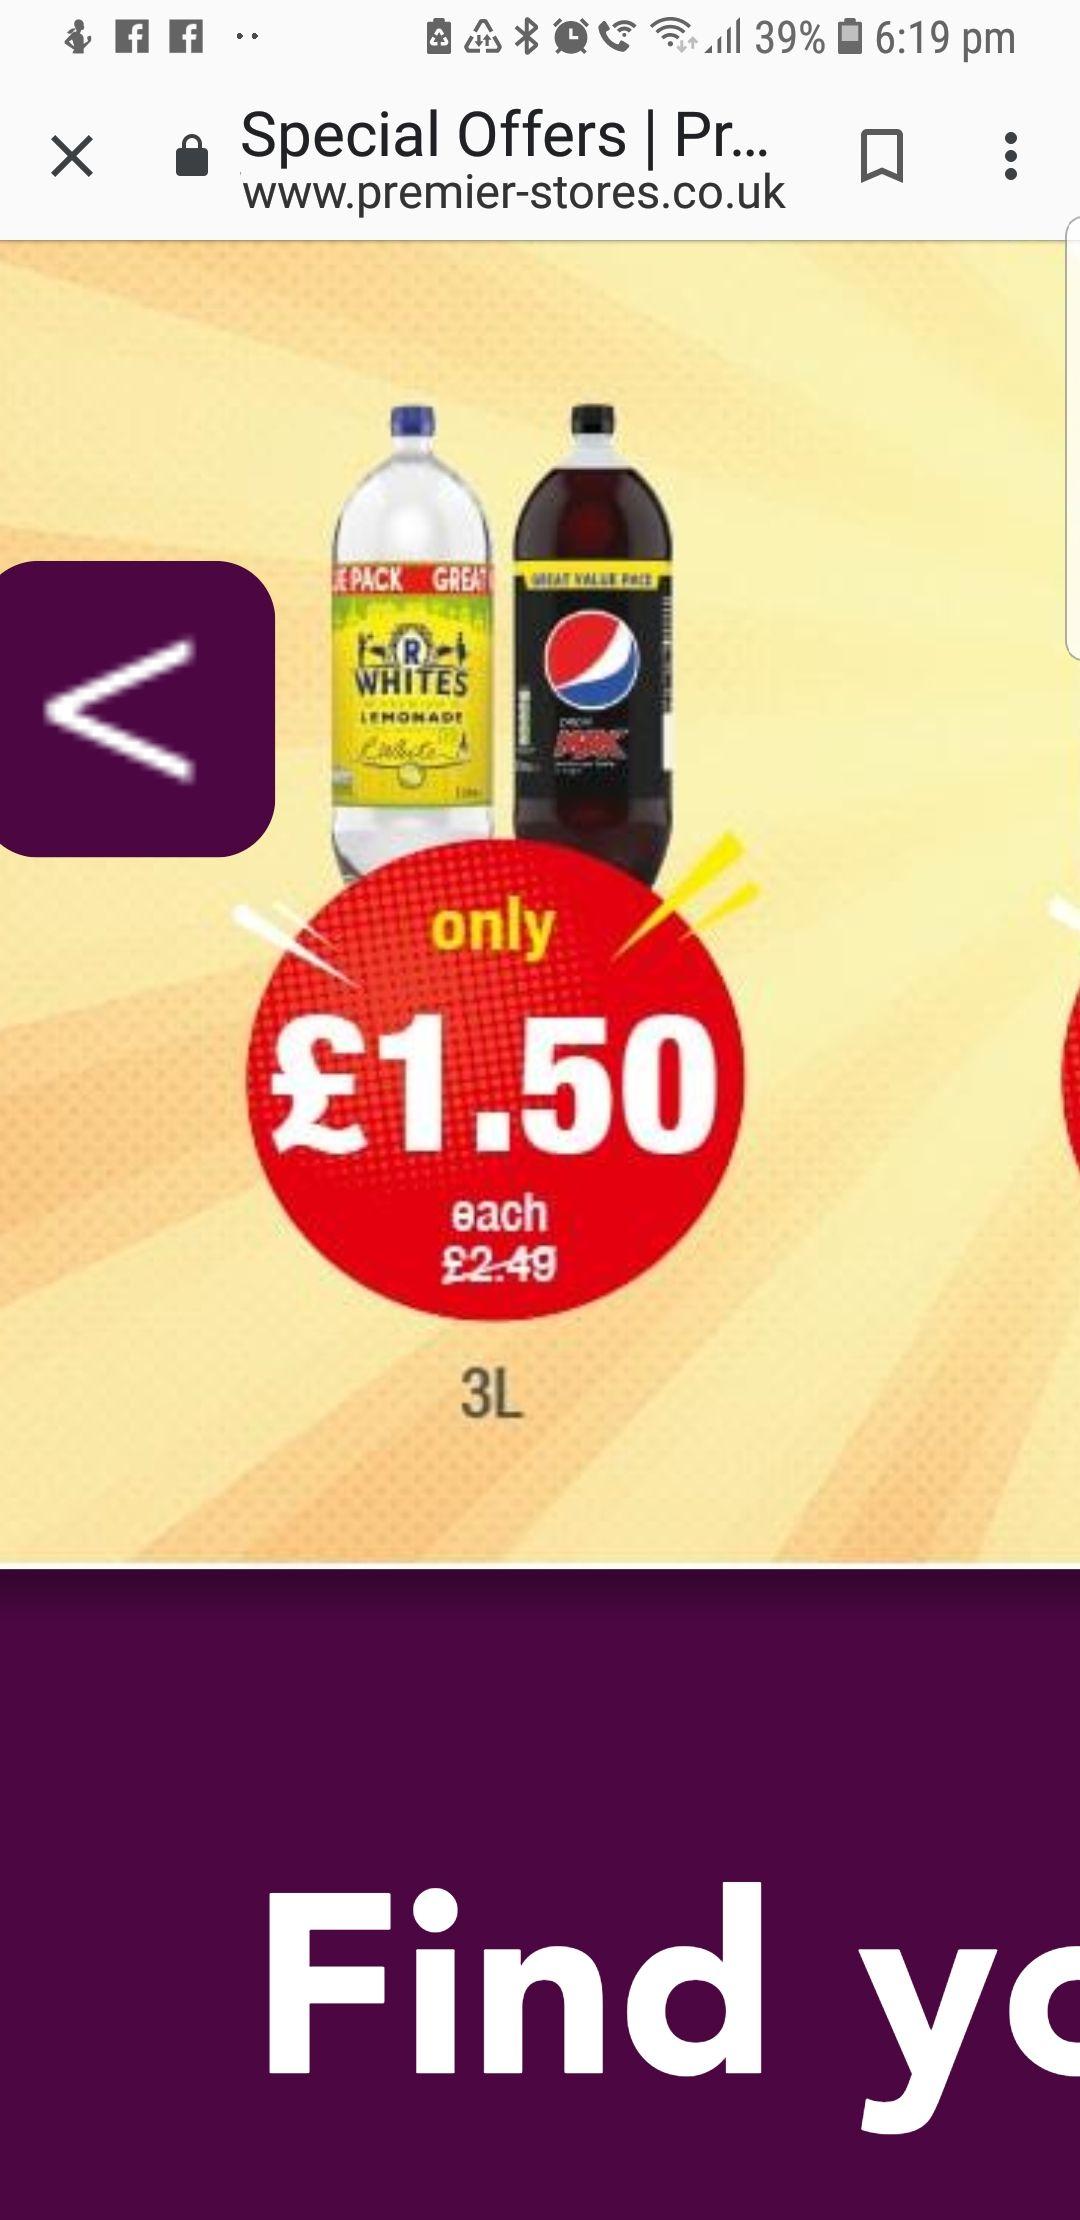 Pepsi Max 3 litre £1.50 ( also R Whites lemonade) £1.50 @ Premier Stores